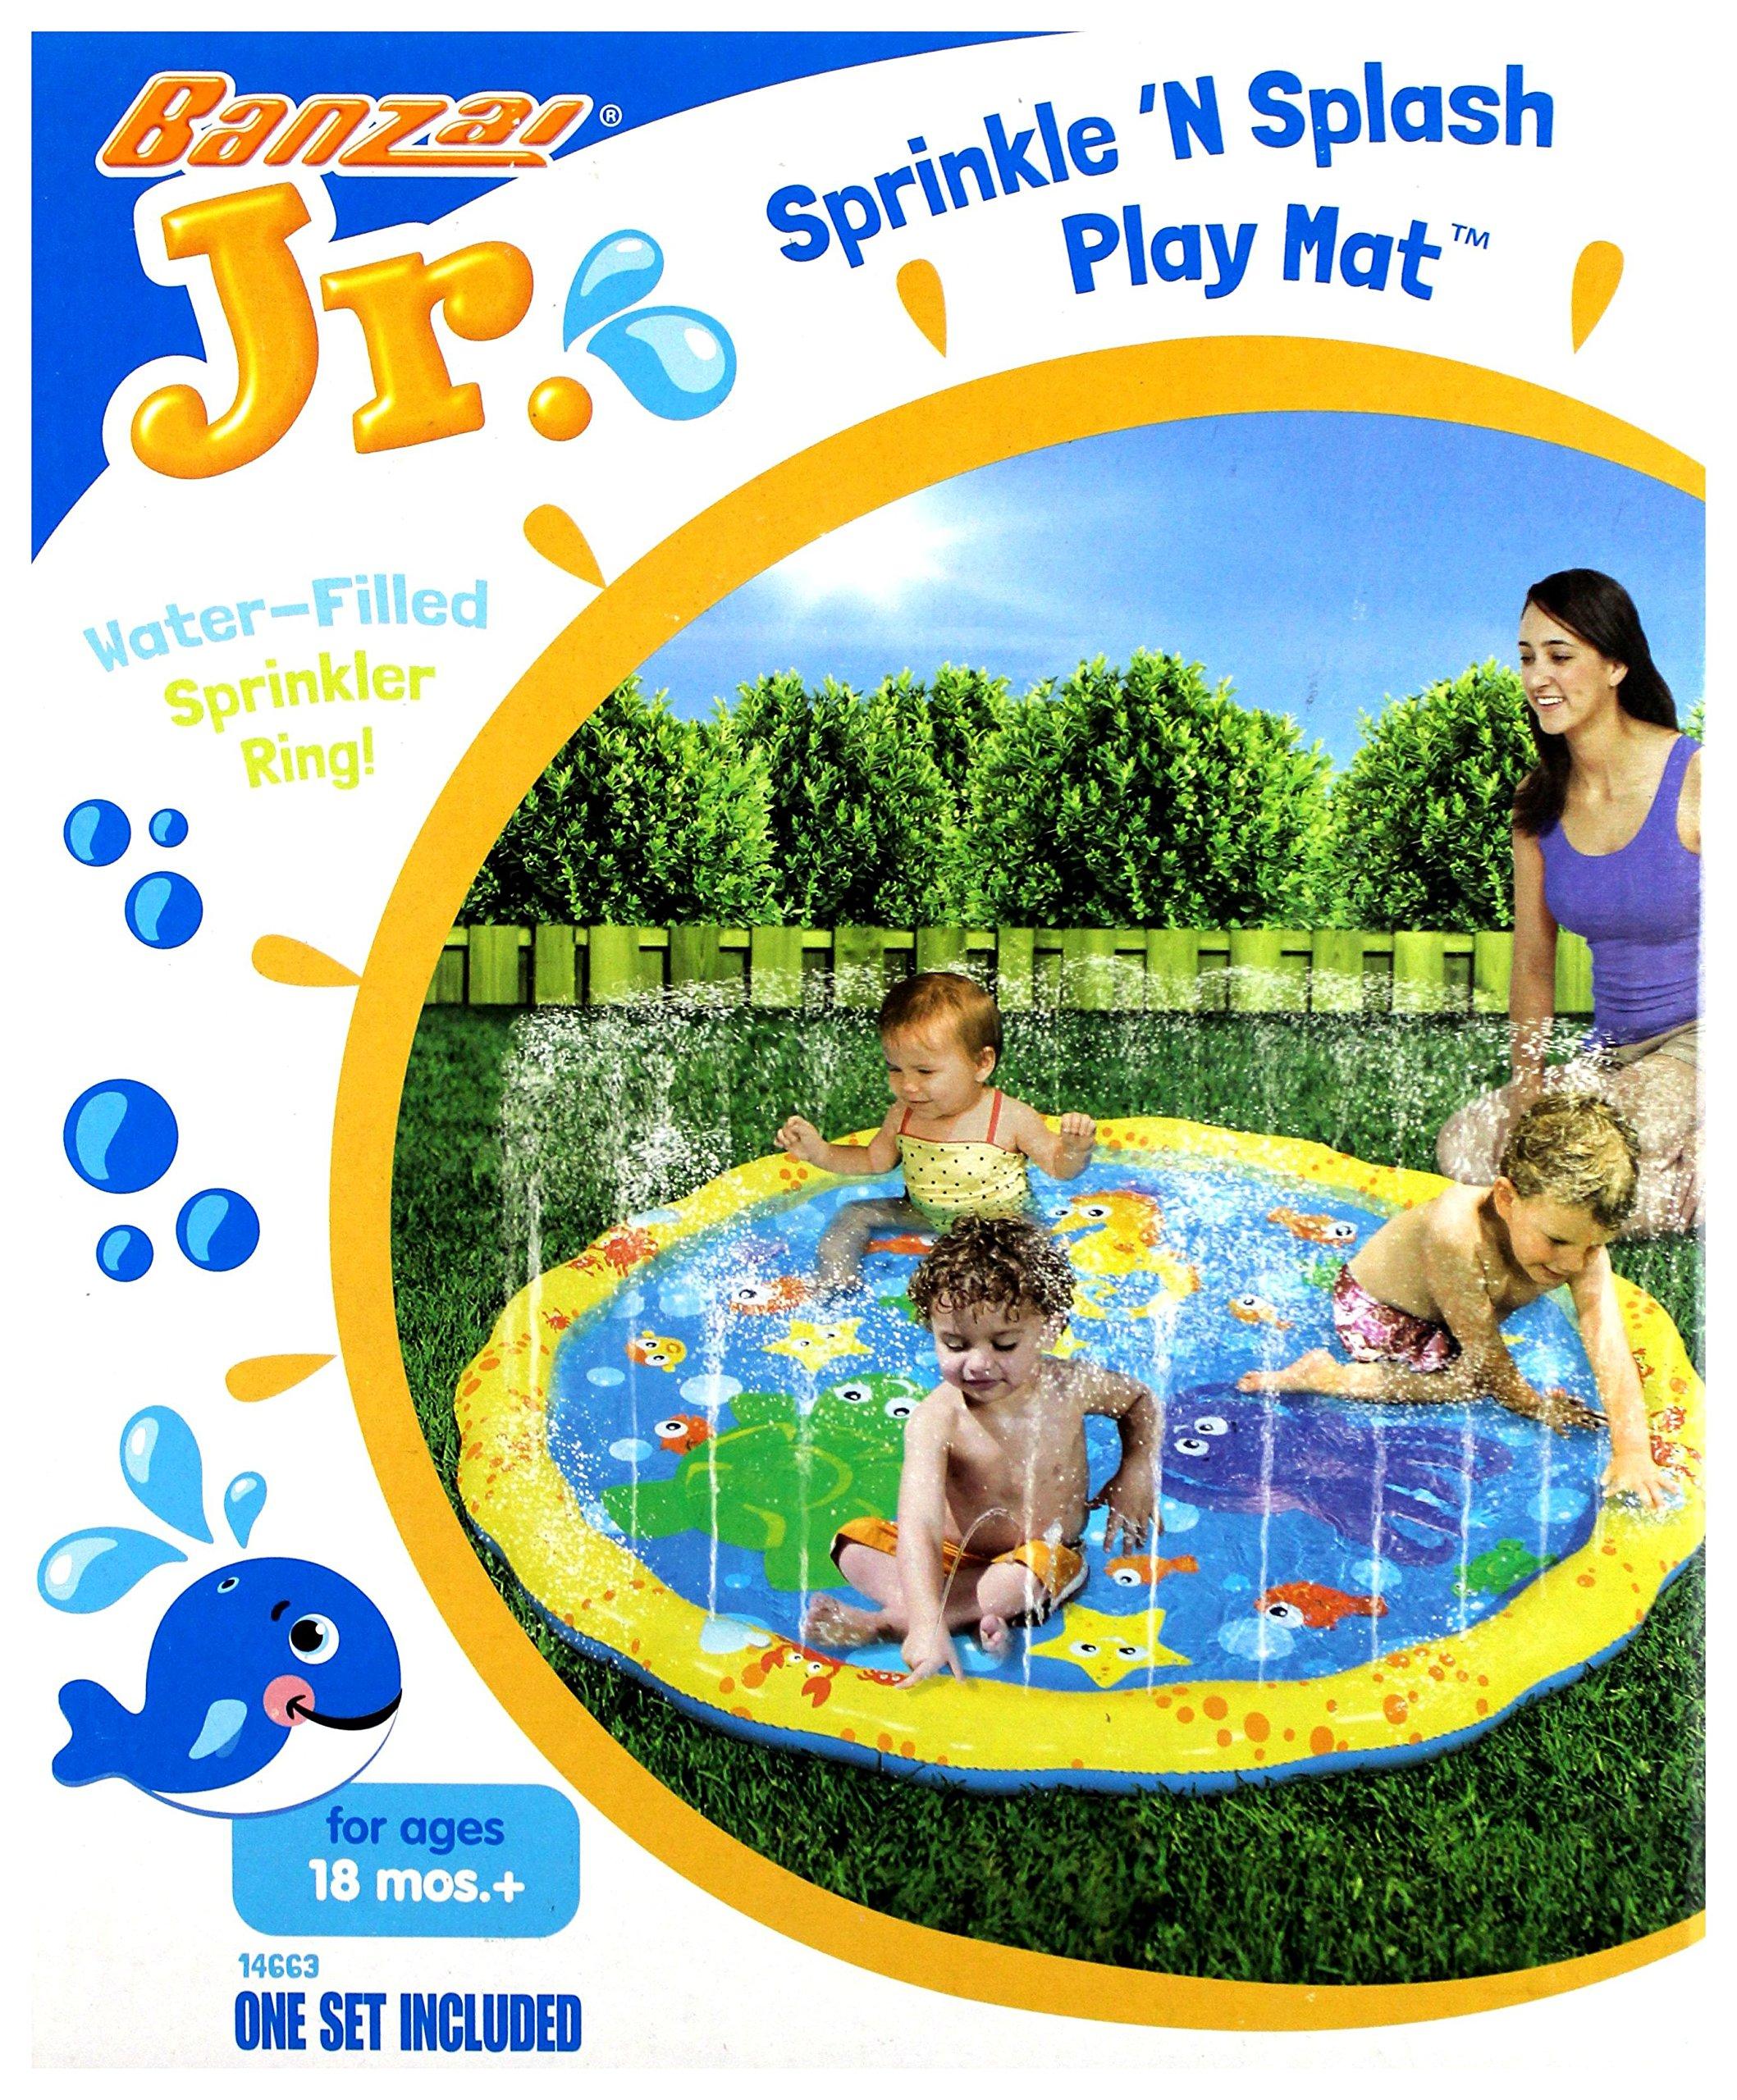 Banzai Jr. 54'' Sprinkle N' Splash Play Mat